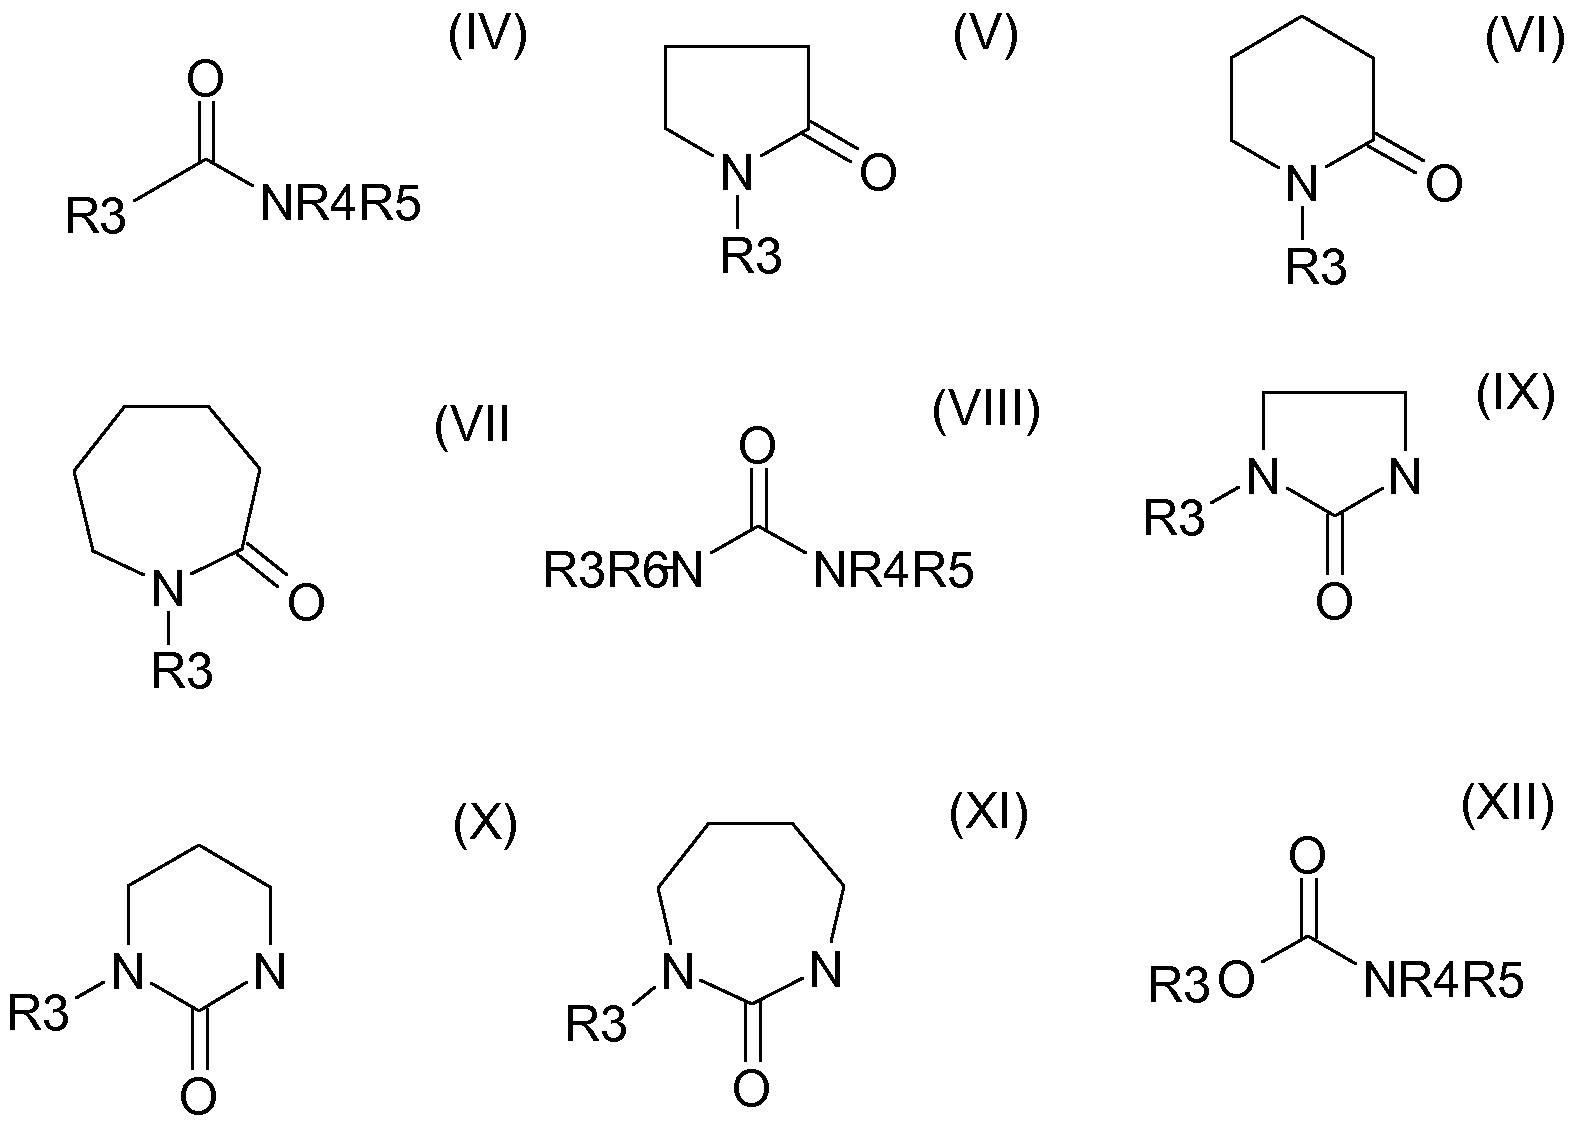 Monomer structure